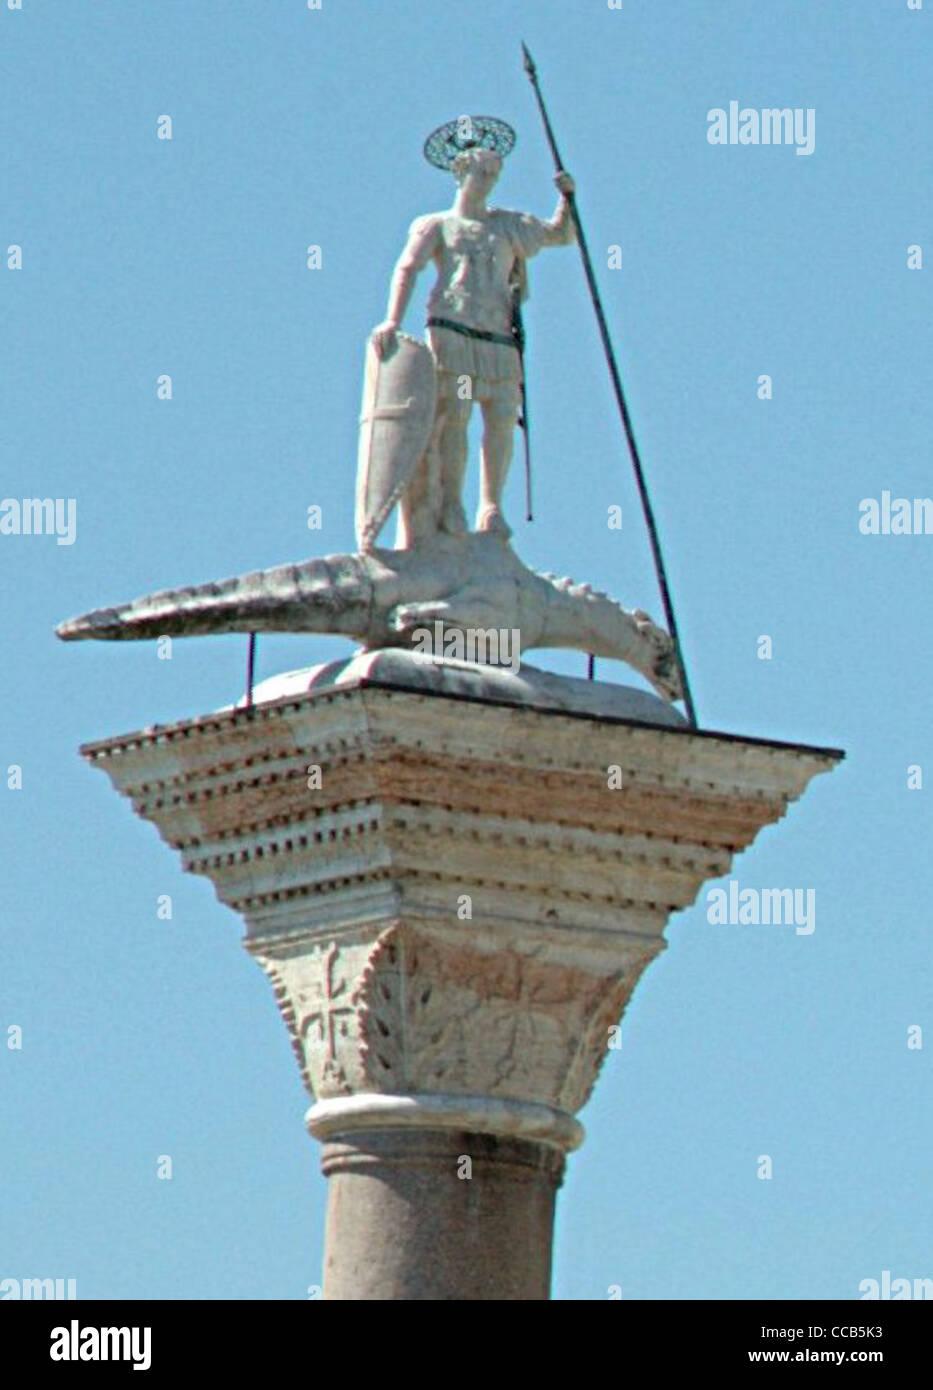 Statue of San Teodoro (Theodore) on a crocodile/drake. Venice, Italy. - Stock Image